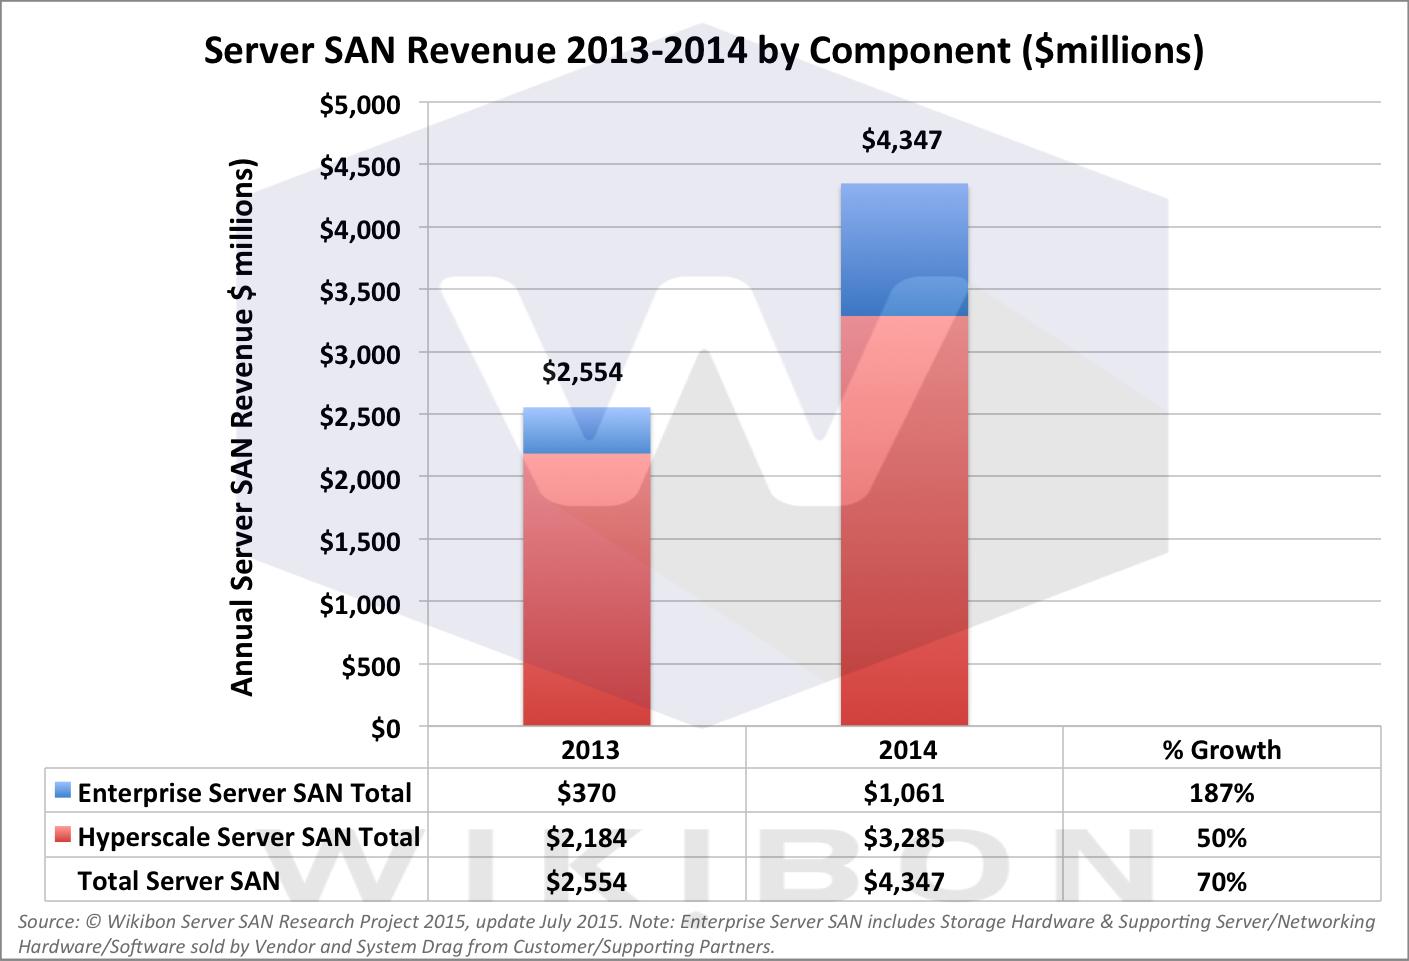 Figure 1: Total Server SAN Revenue for 2013 & 2014  Source: © Wikibon Server SAN Research Project 2015